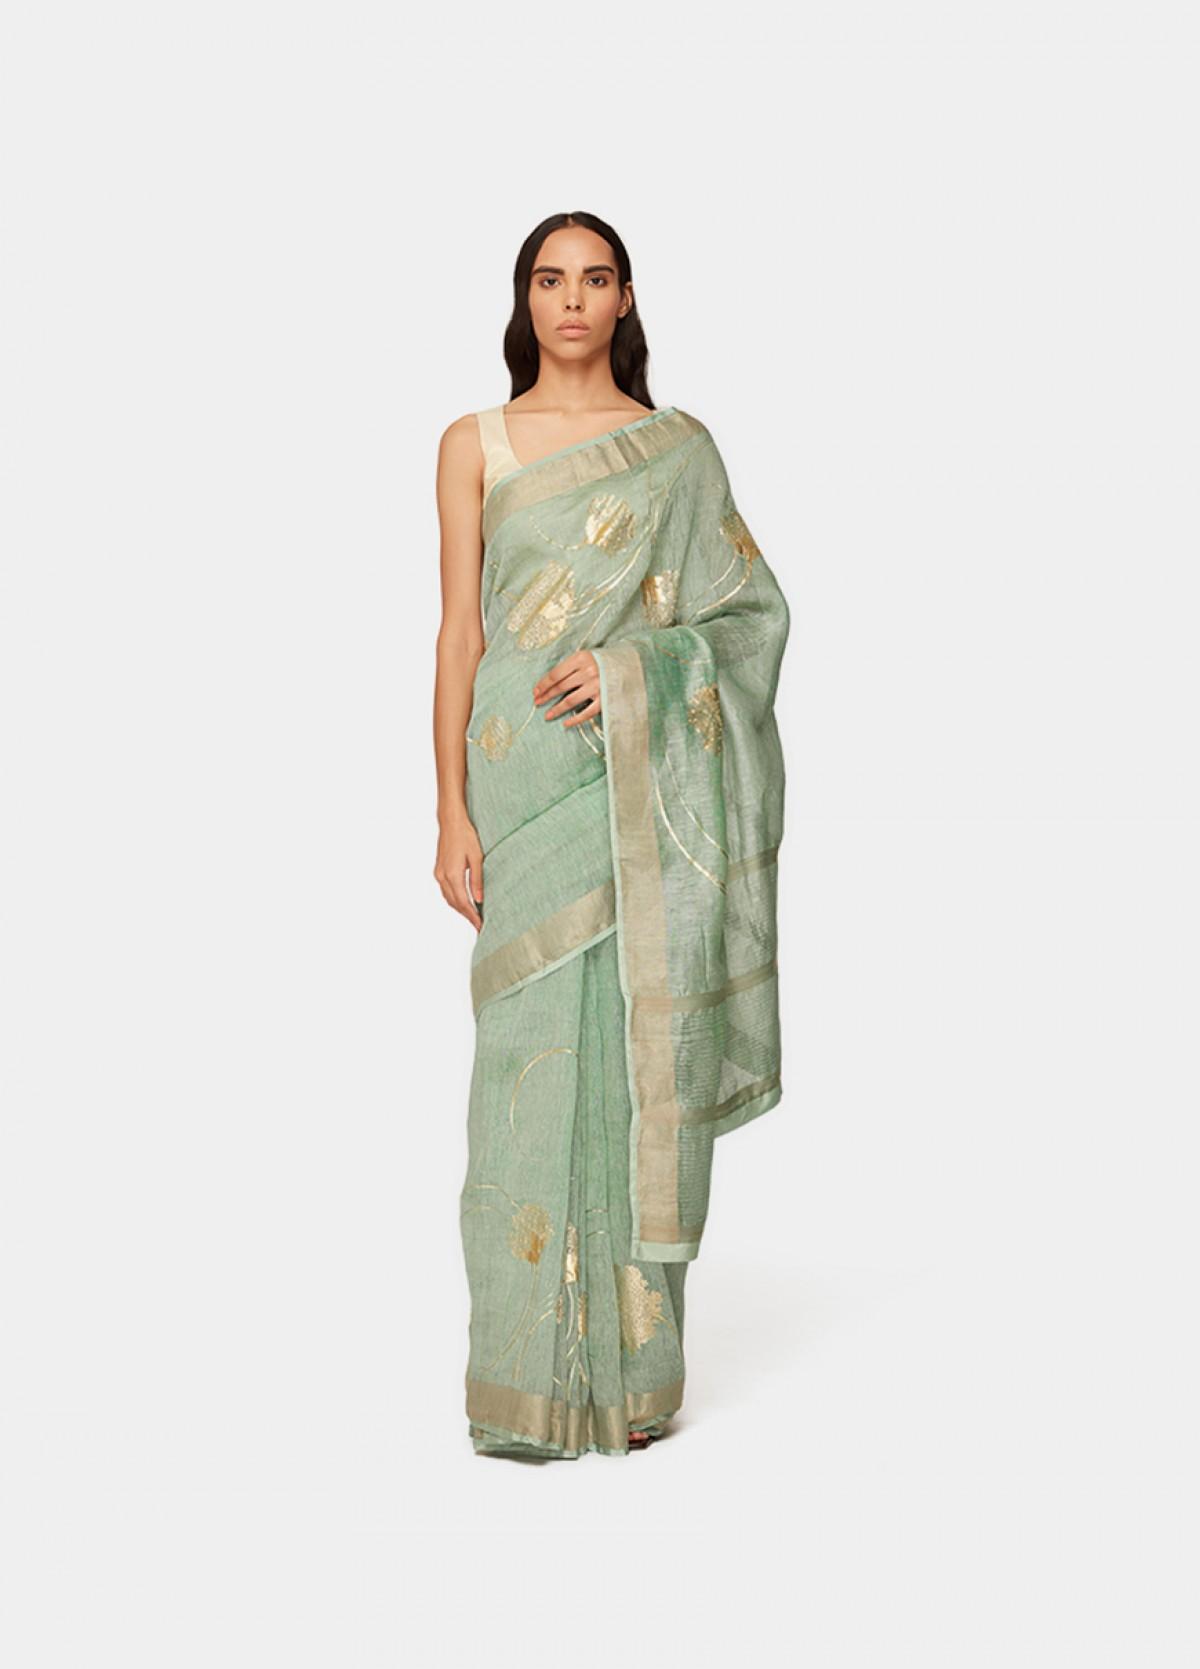 The Swarnim Sari